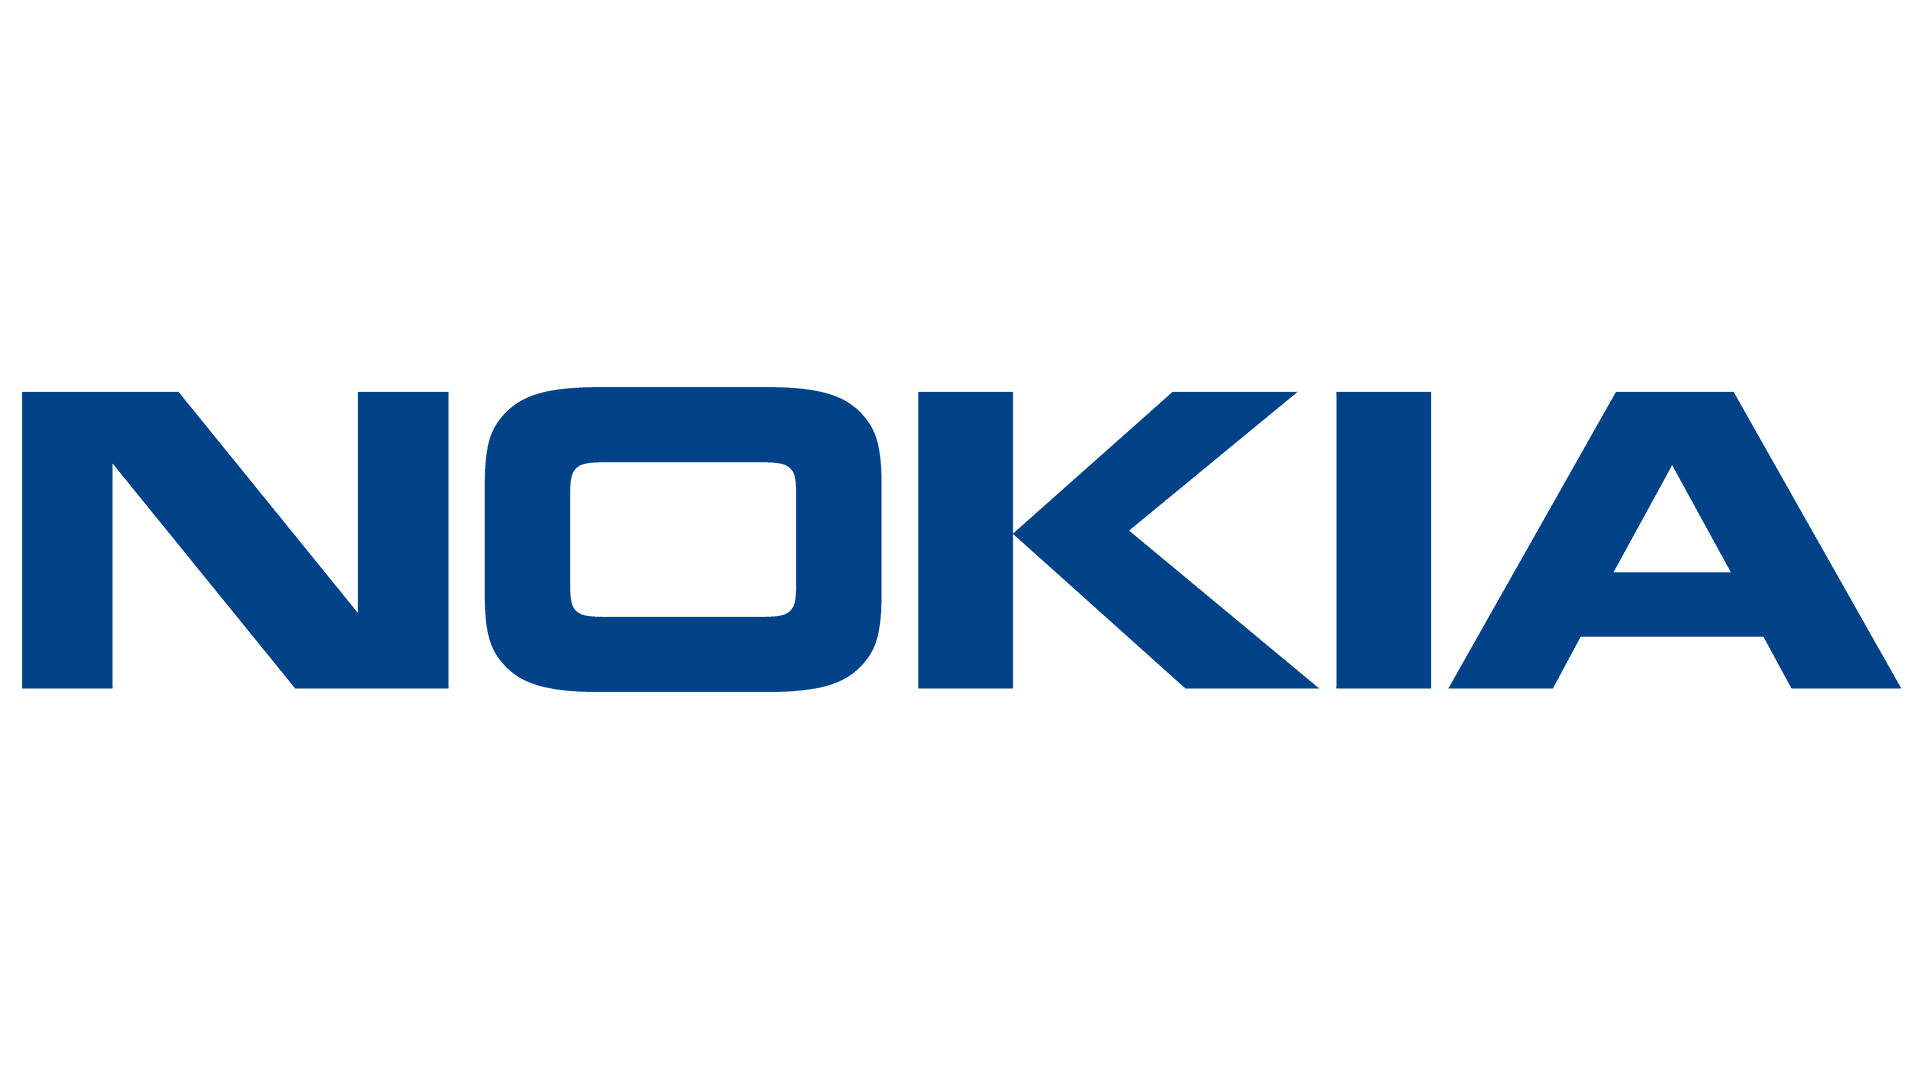 logo Nokia agence creads